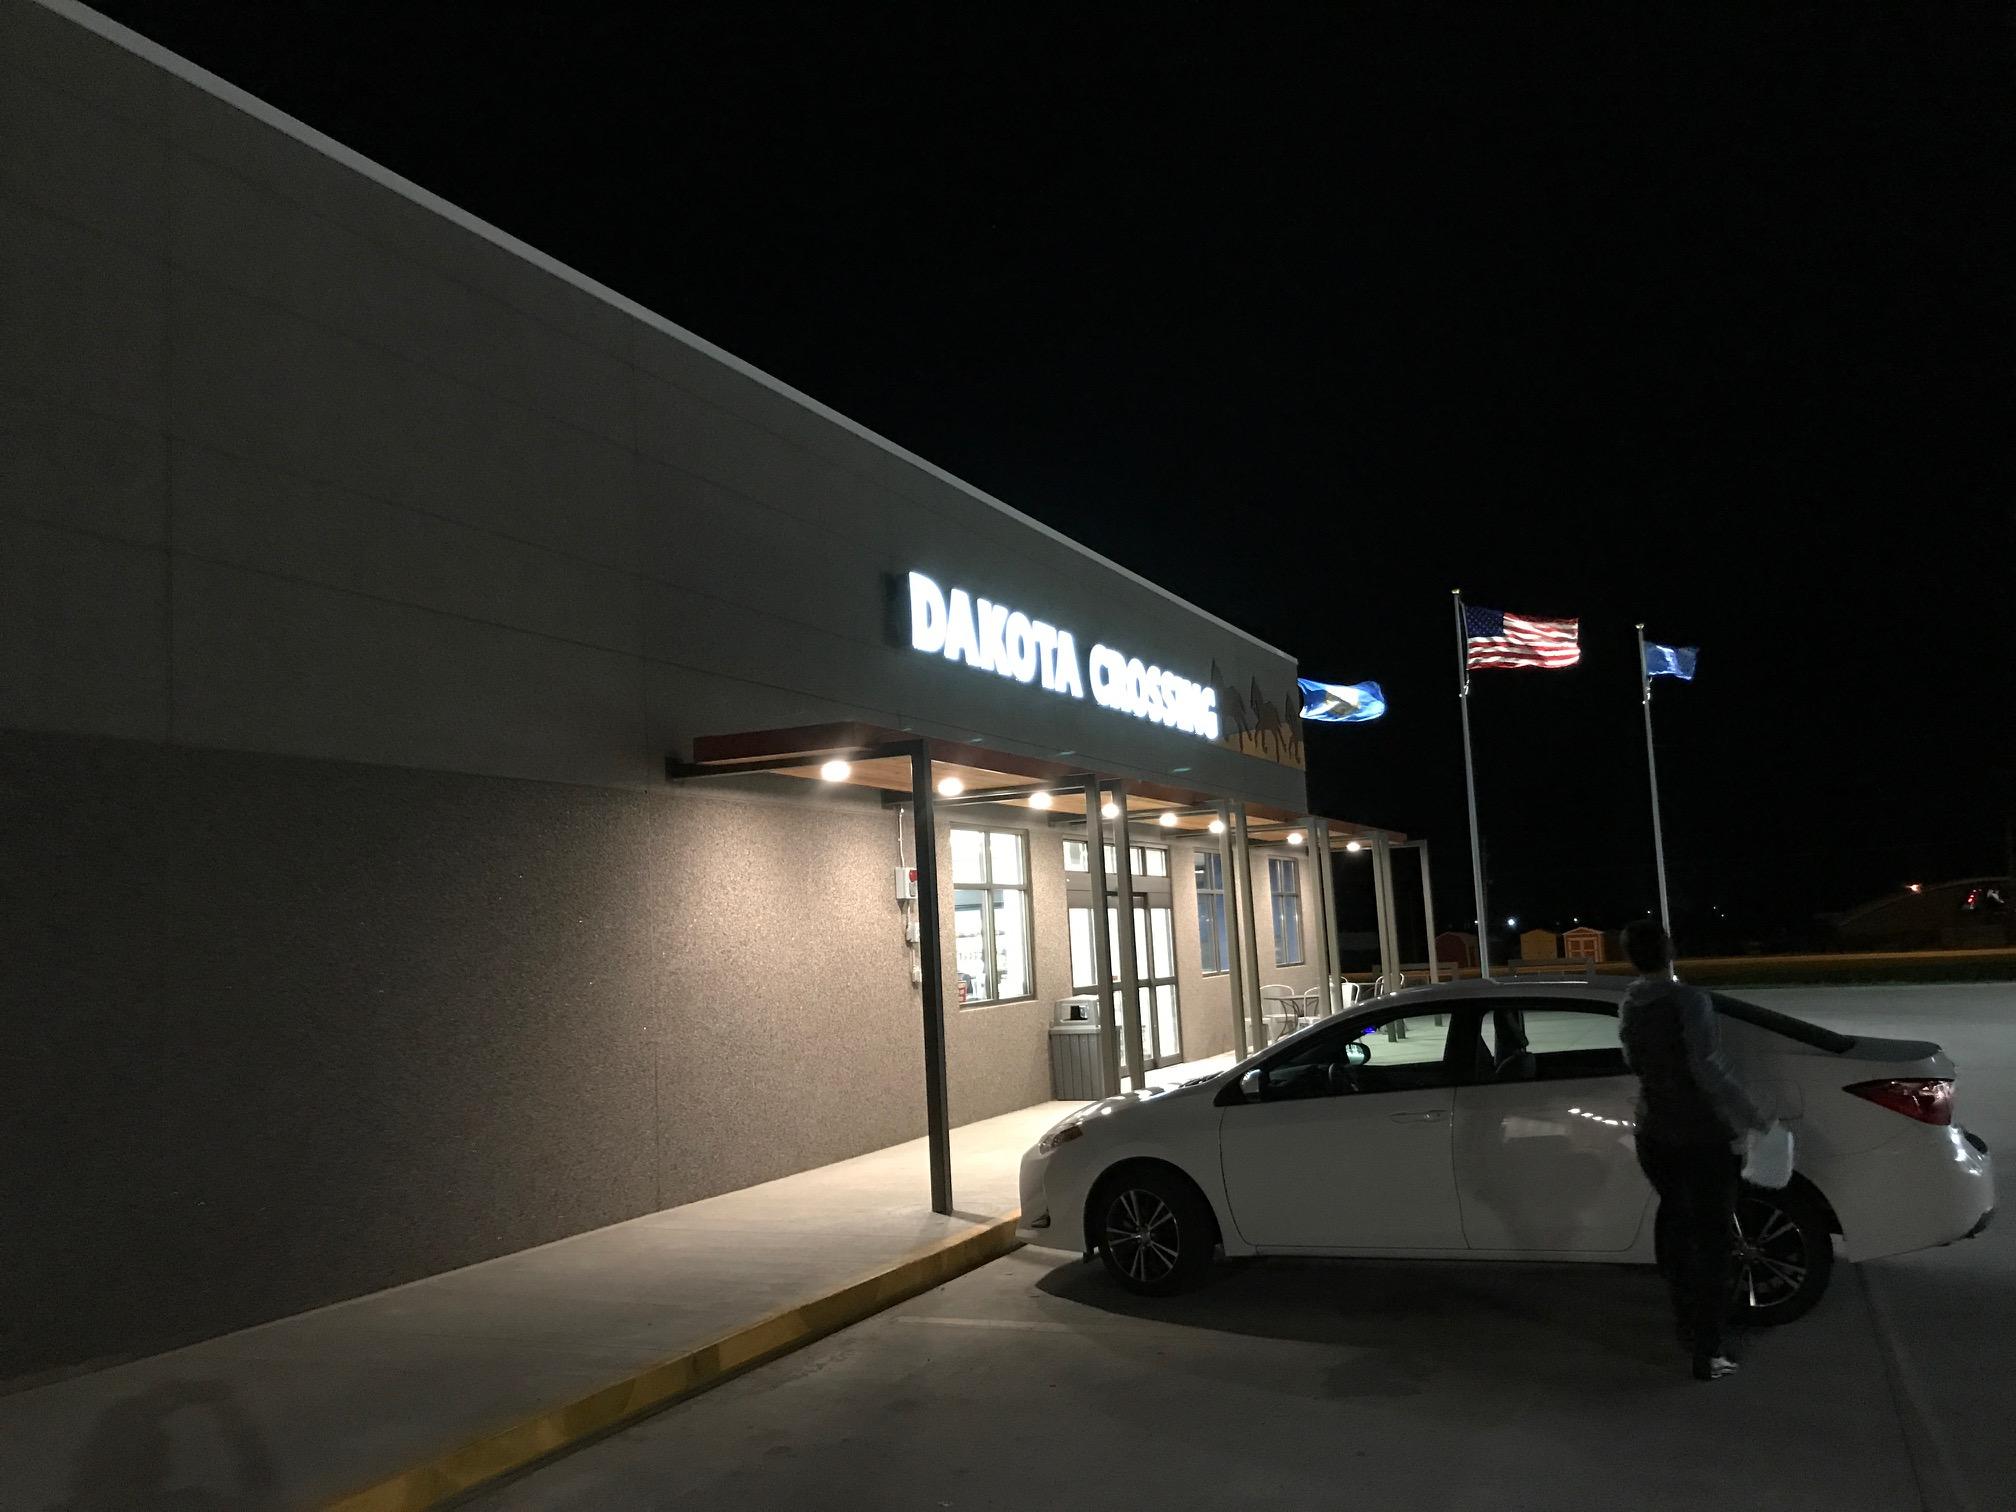 Dakota Crossing Store -